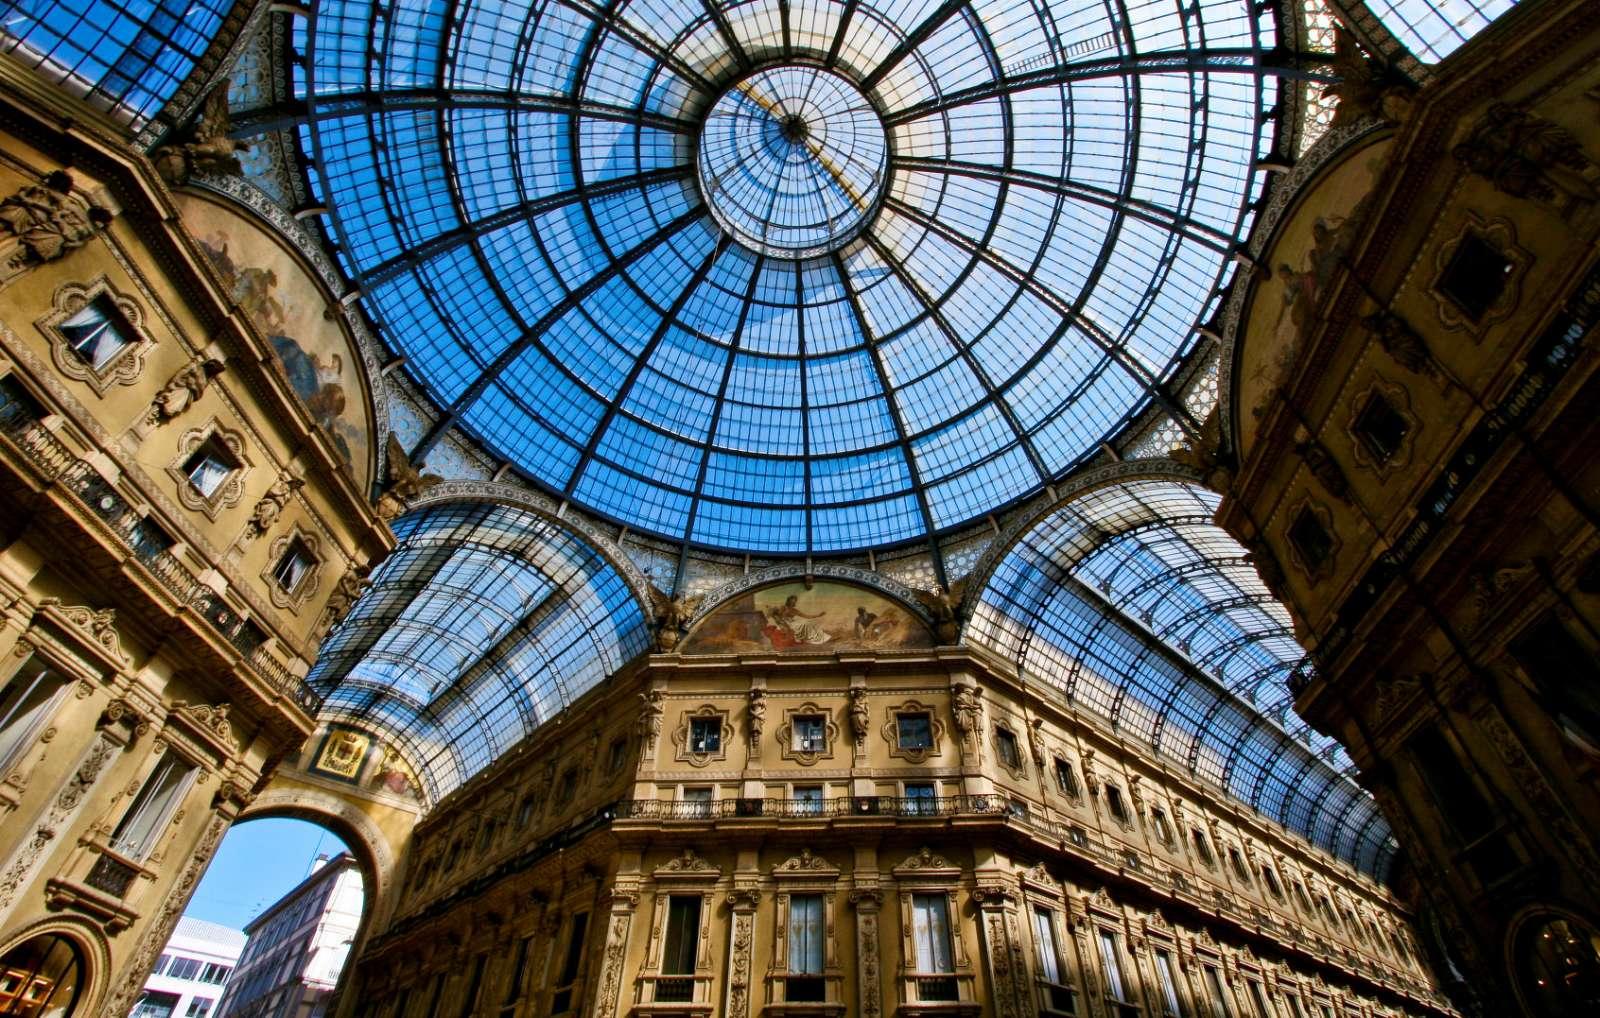 Den imponerande konstruktionen i taket i gallerian Vittorio Emanuele II